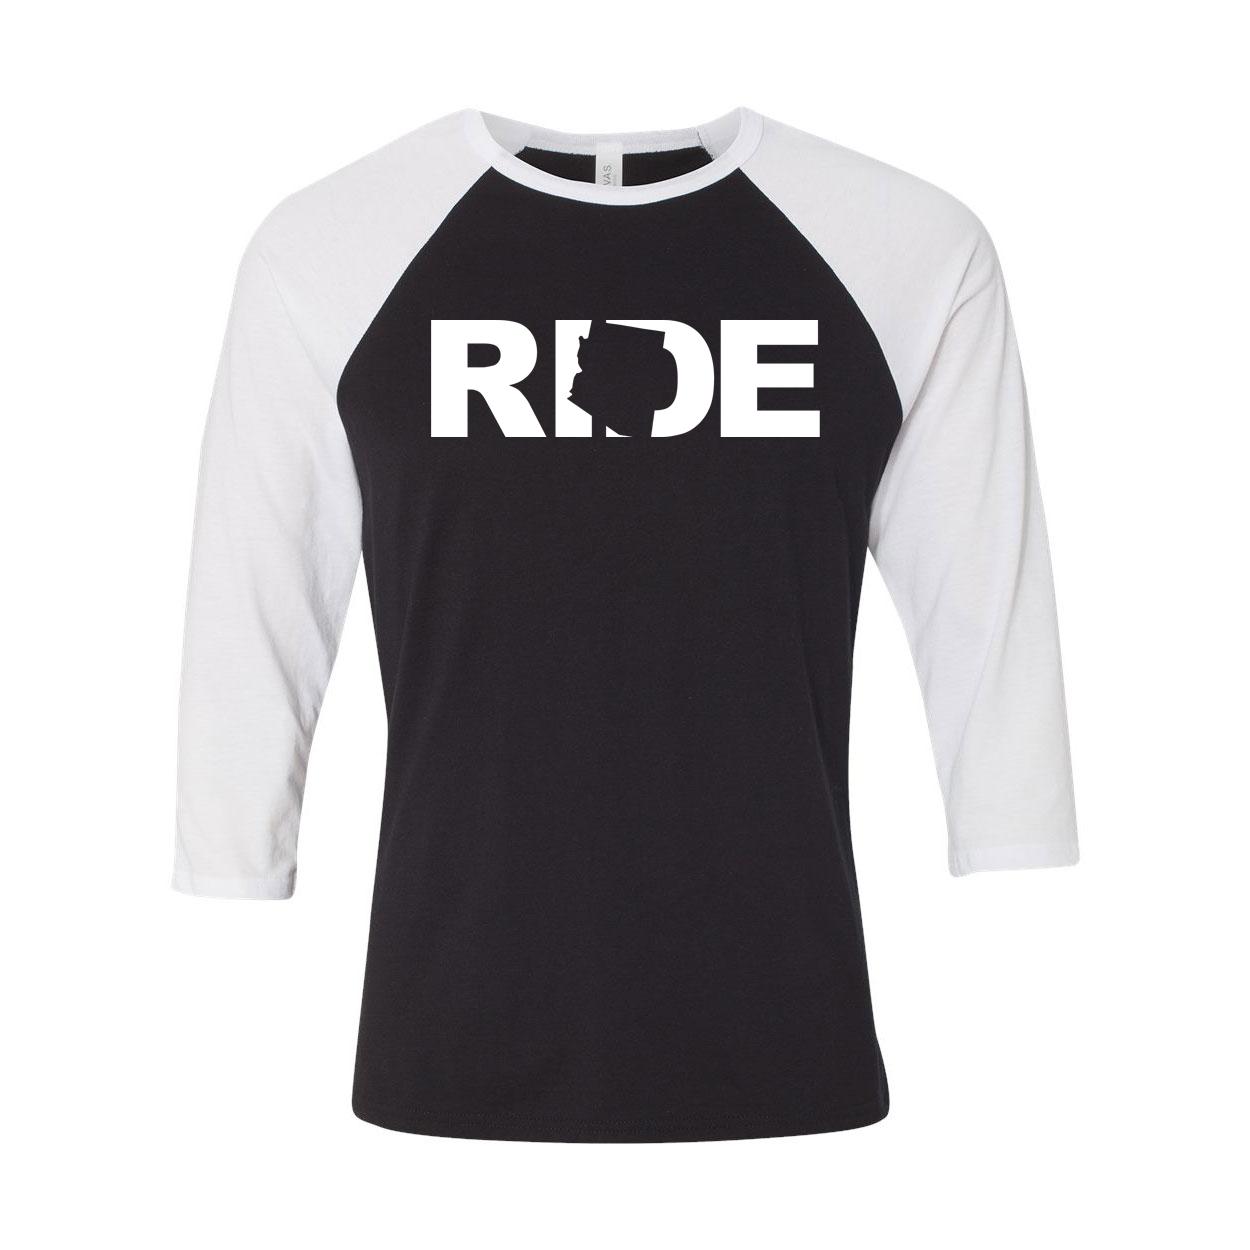 Ride Arizona Classic Raglan Shirt Black/White (White Logo)